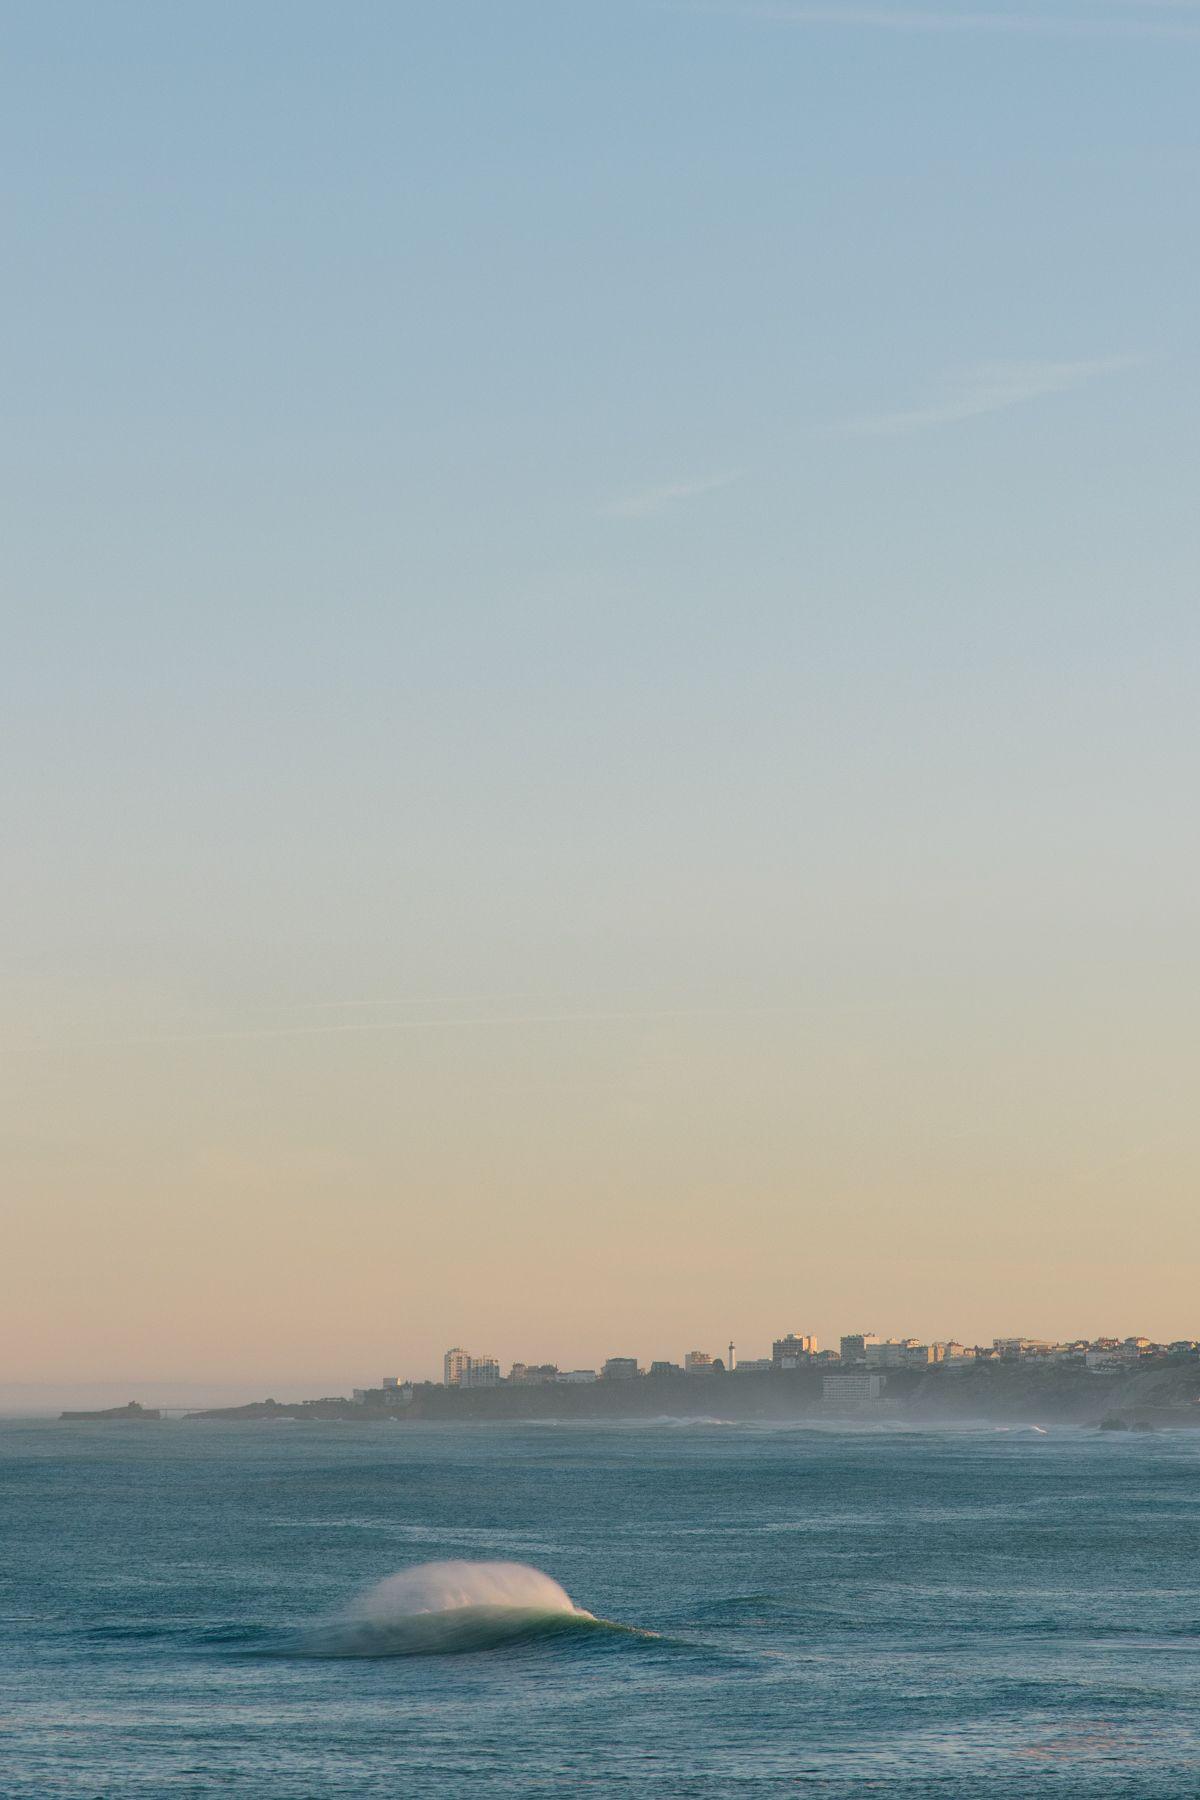 Thomas Lodin | Daily Surf, Lifestyle Photographs